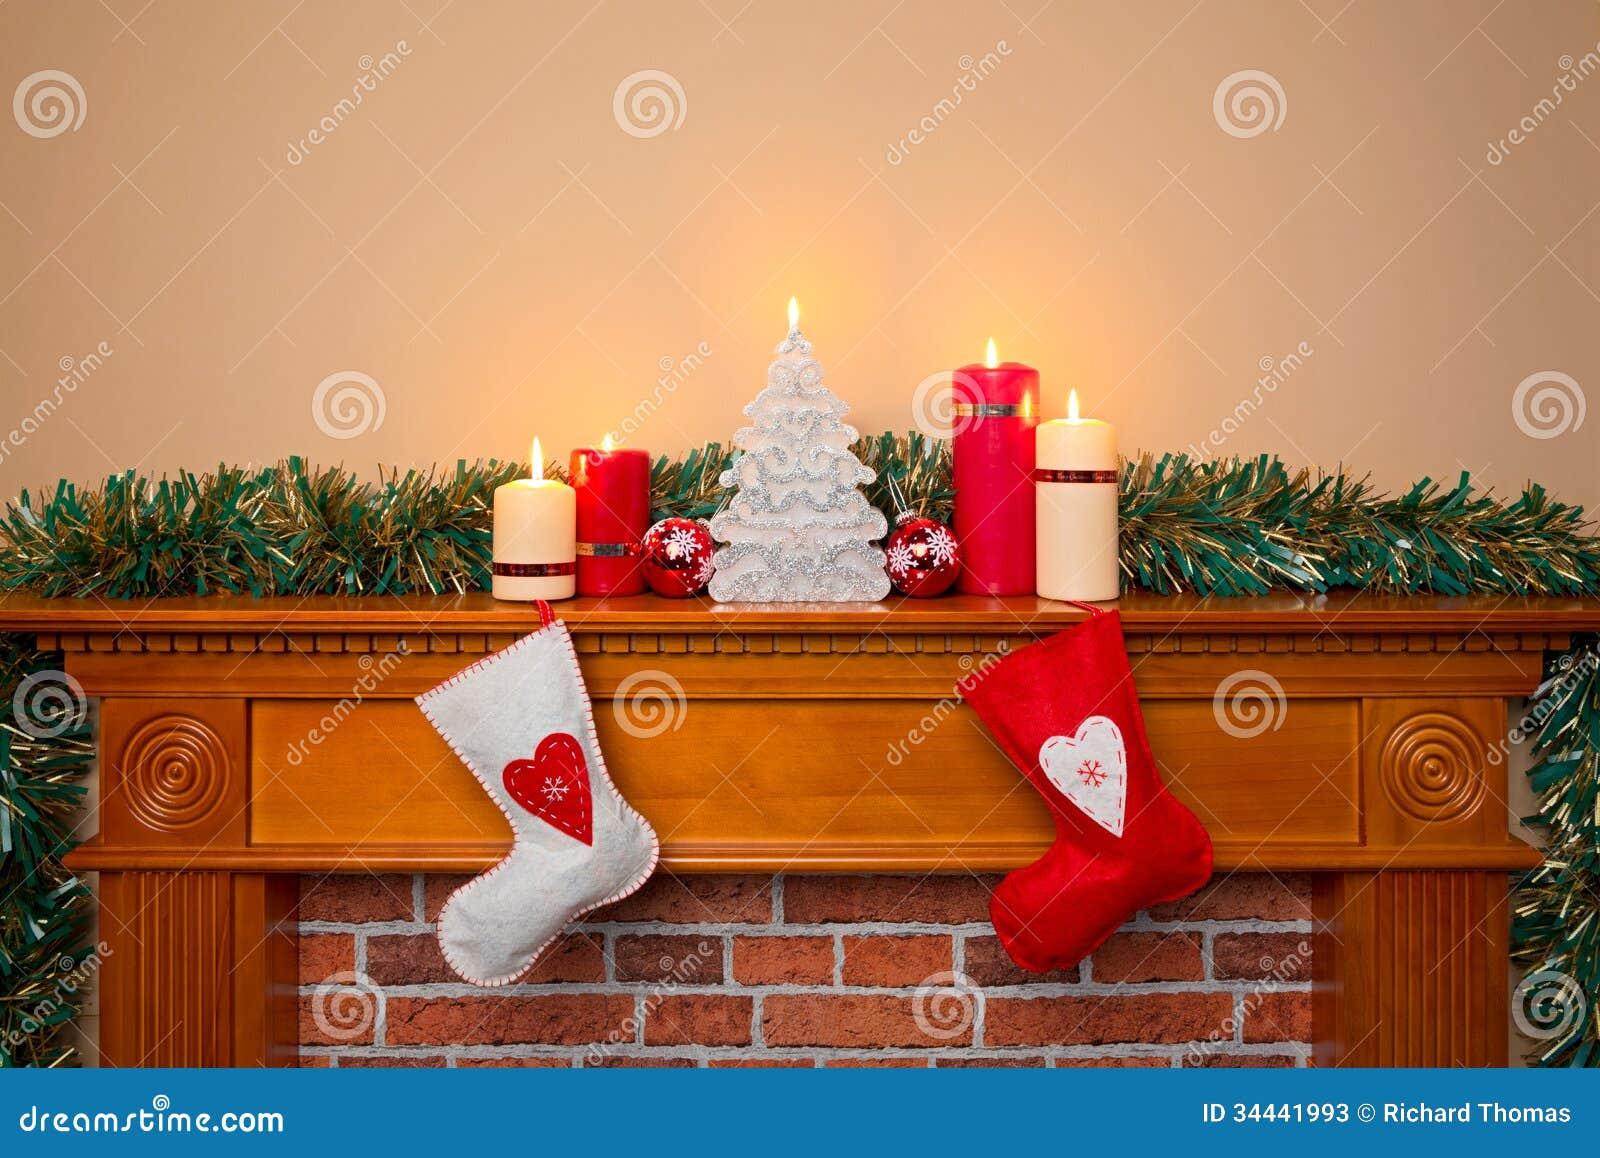 Empty Christmas Stockings